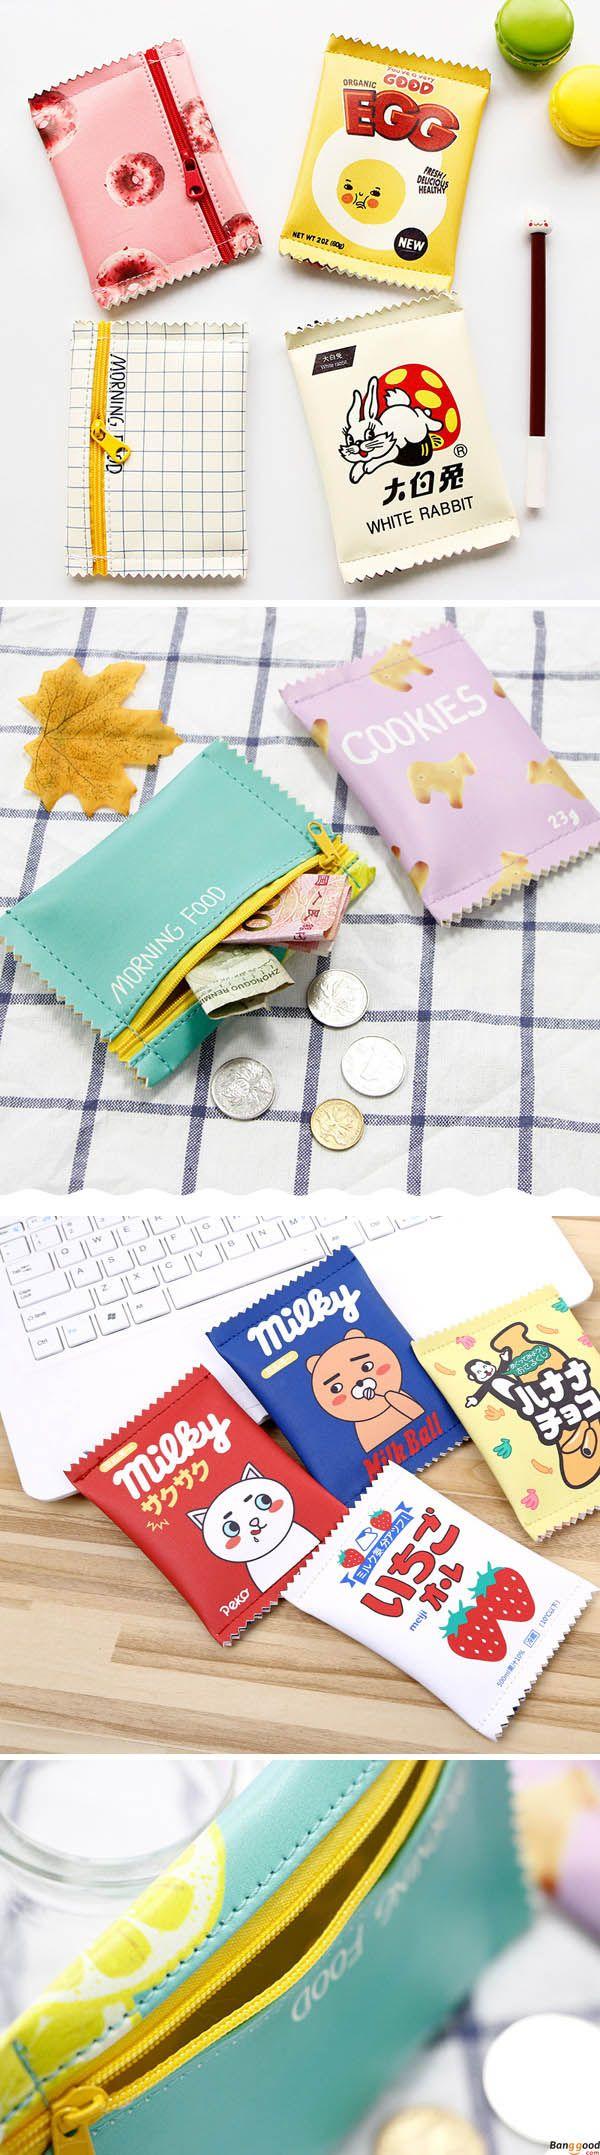 US$3.78+ Free Shipping. Women Girls Cute Fashion Snacks Coin Purse Mini Wallet Money Bag Key Change Pouch.  Women fashion, purse, wallet. Shop at banggood.